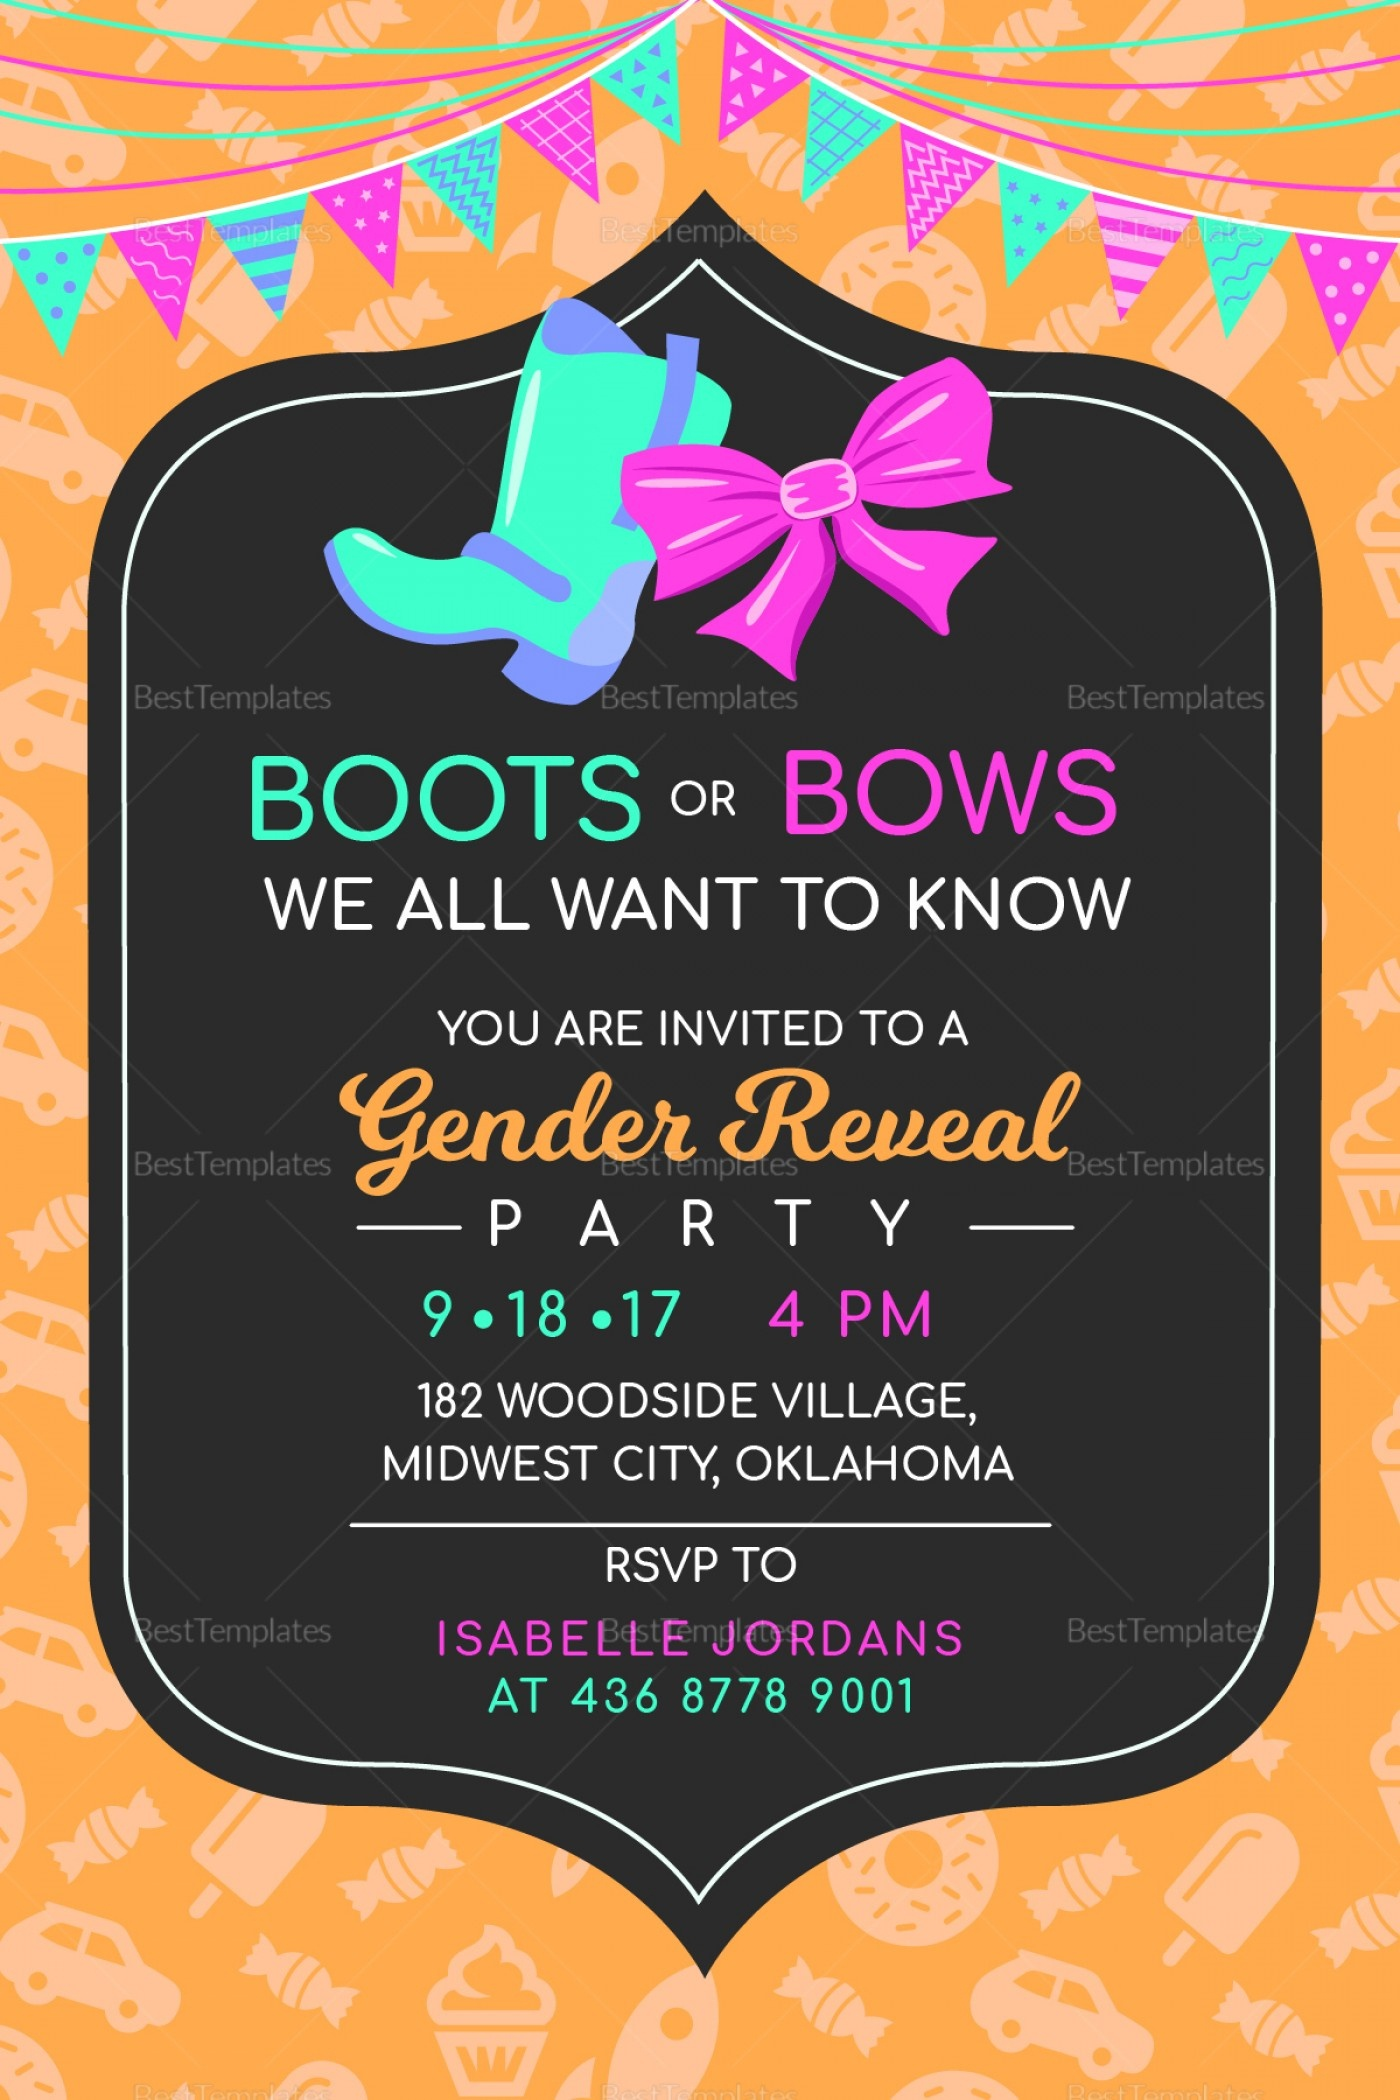 012 Free Printable Gender Reveal Invitations Invite For Your Party - Free Printable Gender Reveal Templates